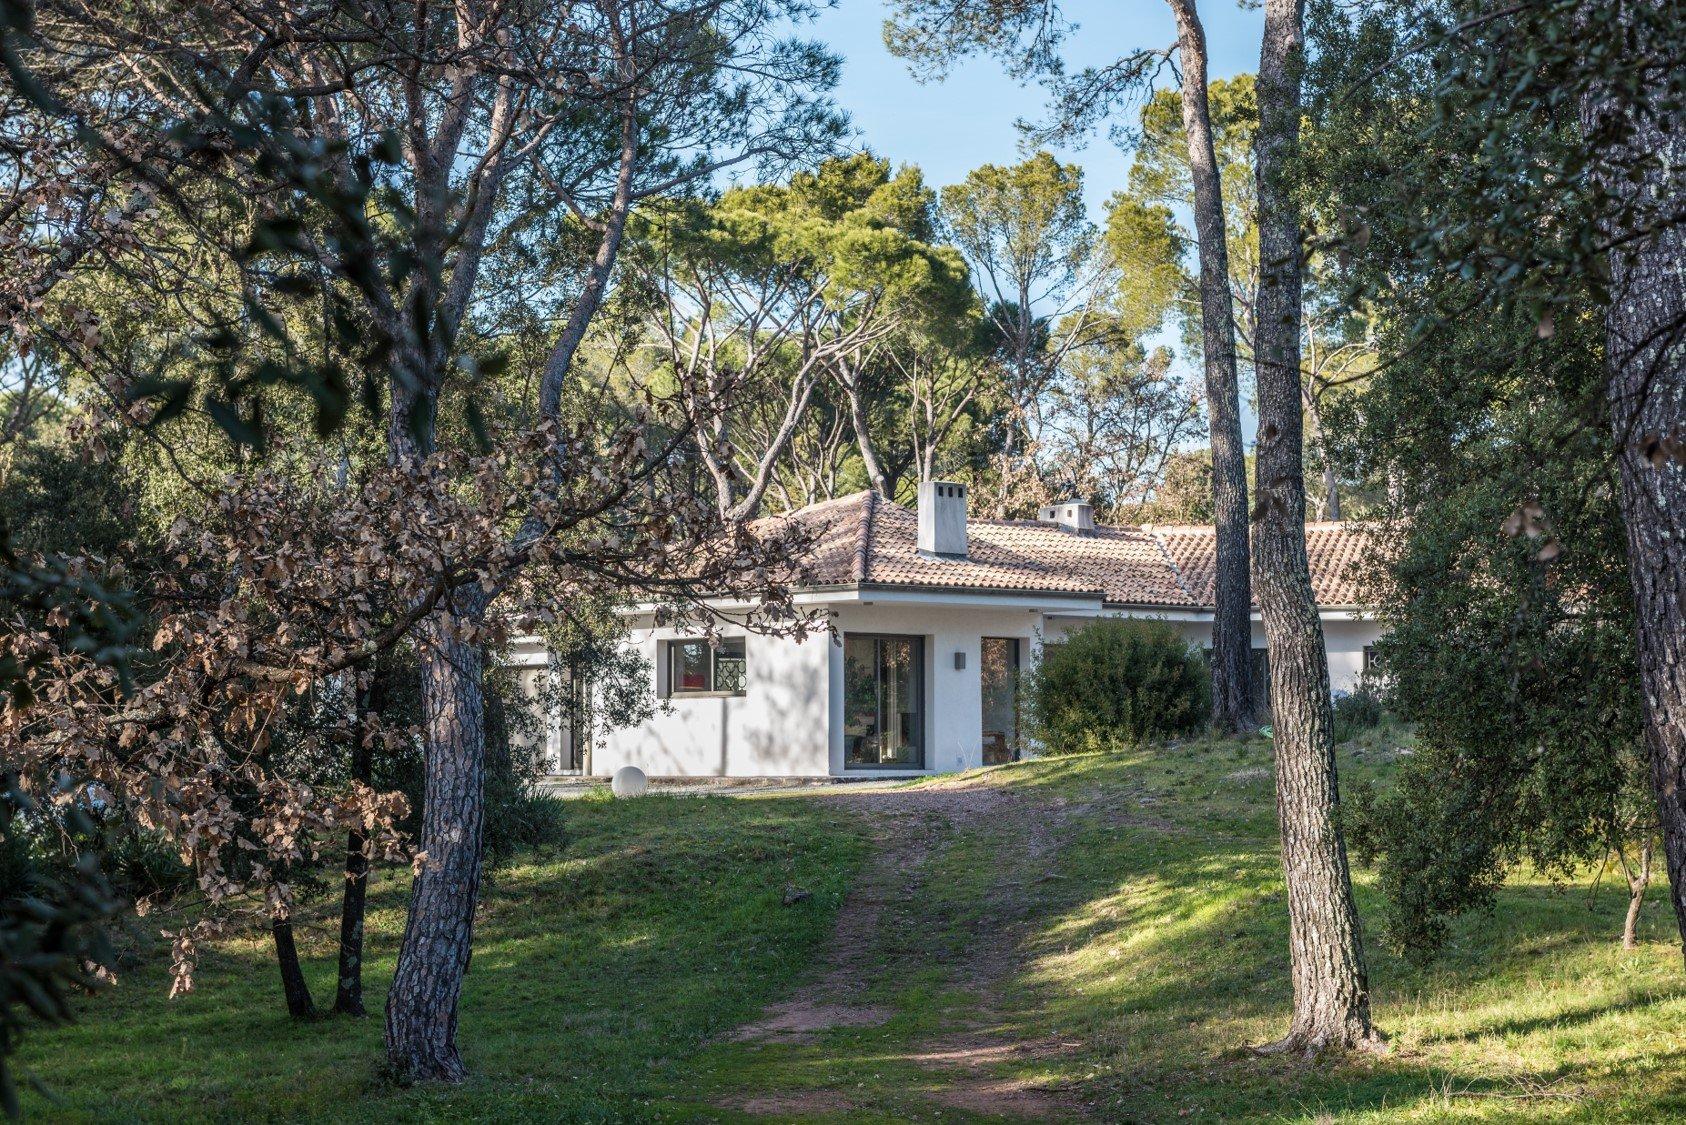 Architect villa on 2 ha land near of the forest